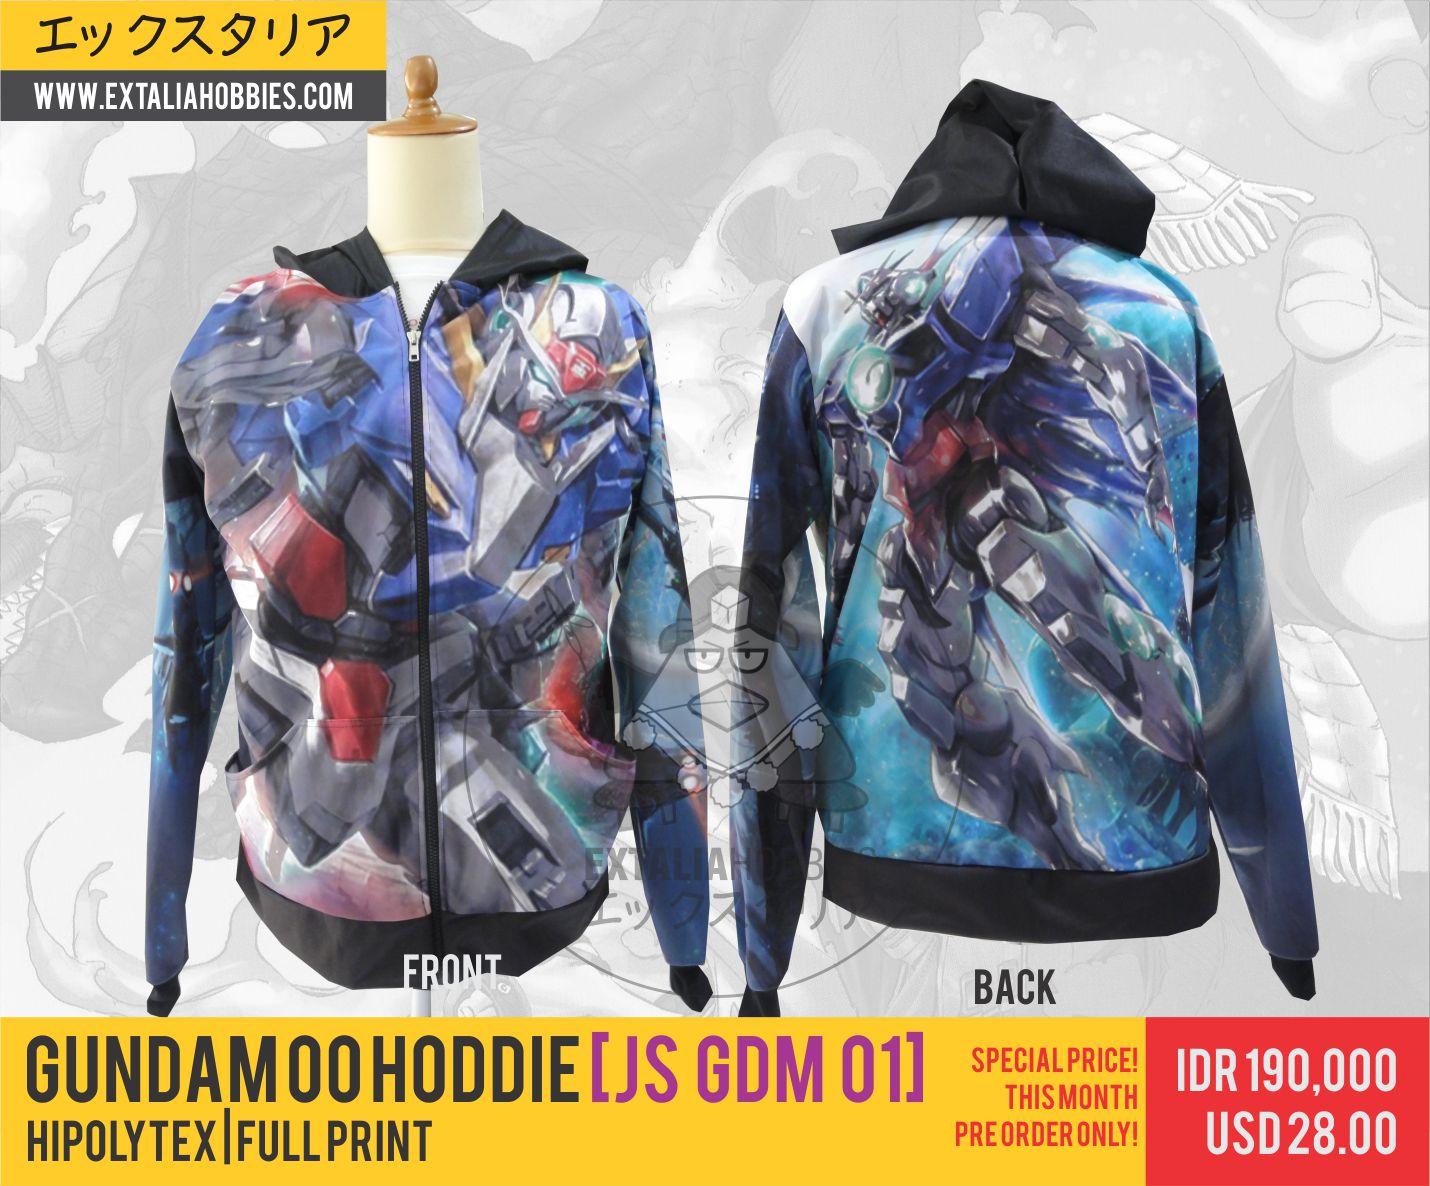 Full Print Gundam 00 Hoodie Special Price June 2015 Extalia Hobbies Jaket Anime Shingeki No Kyojin Green Kode Z 04